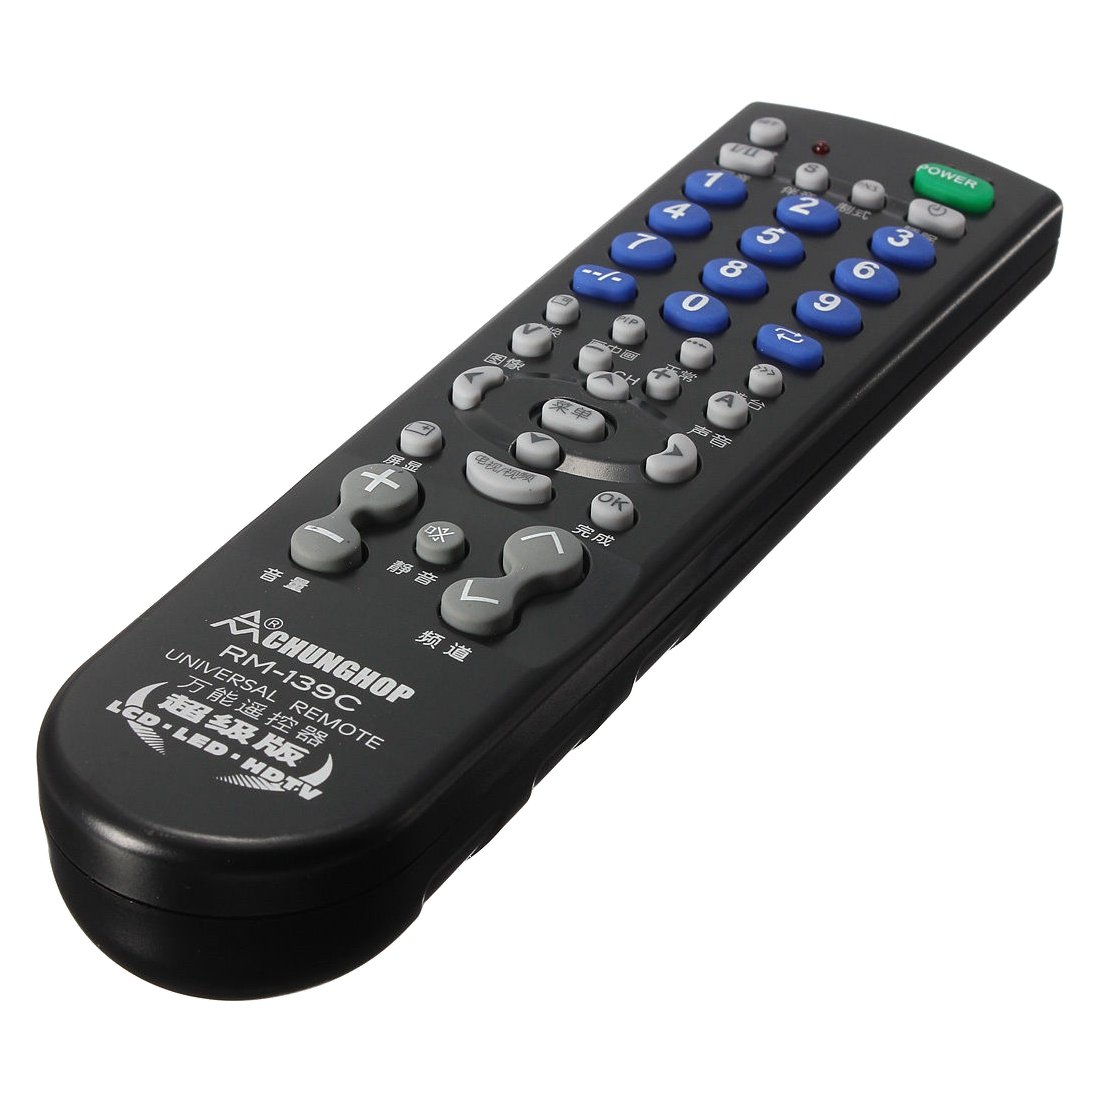 CHUNGHOP RM-139C Universal TV Remote Control Black